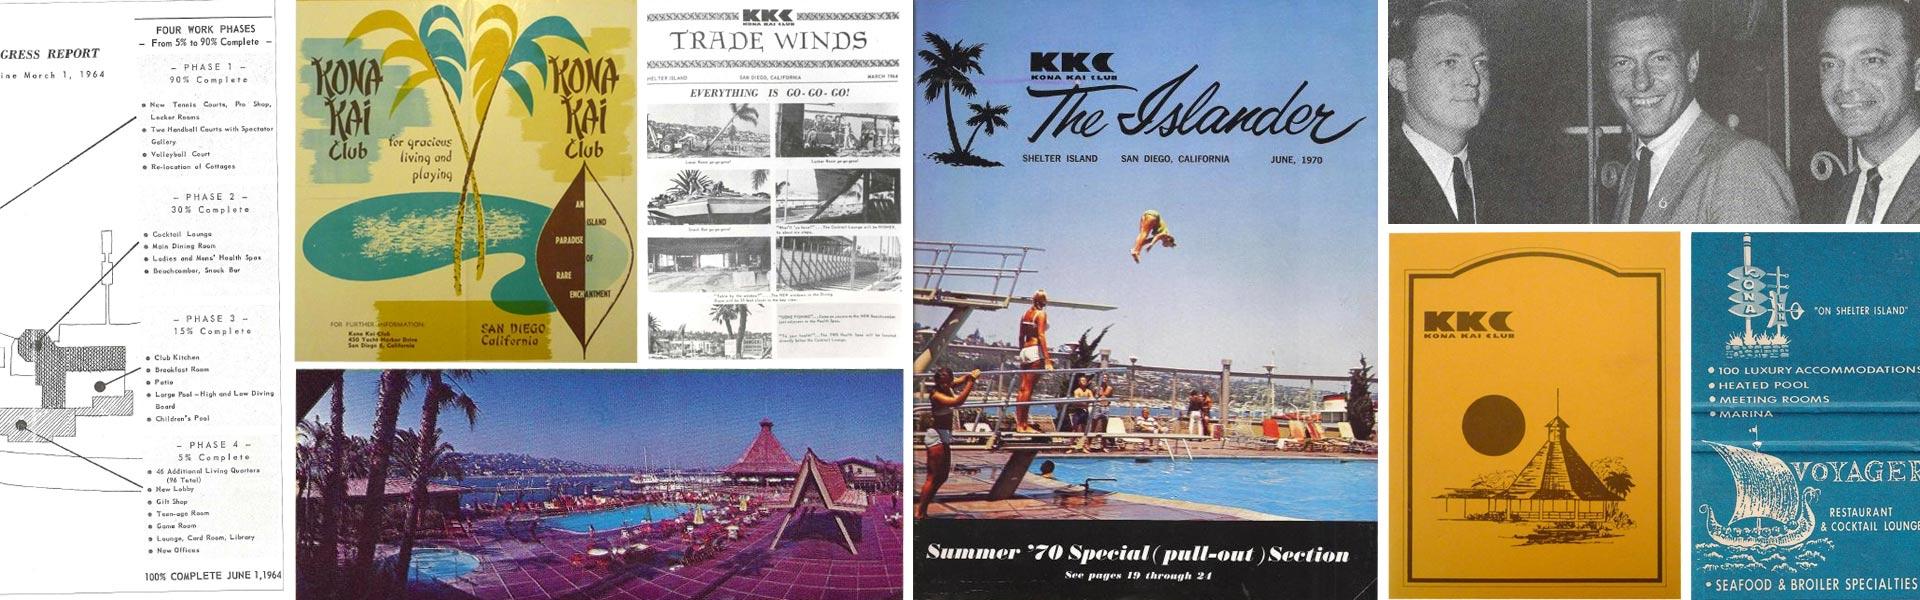 Kona Kai Club history